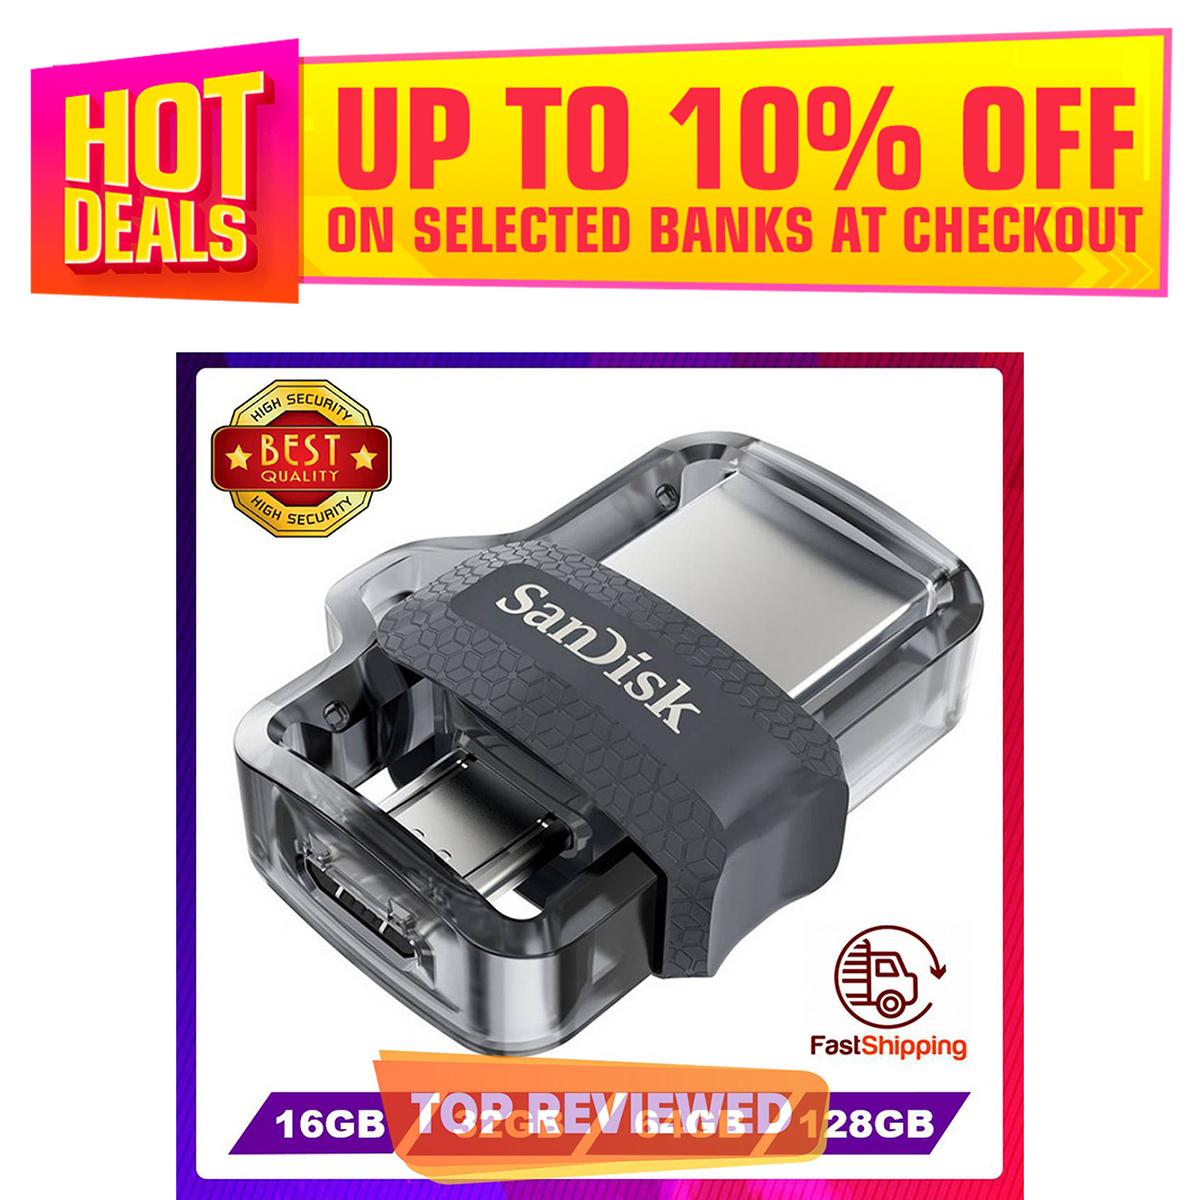 SanDisk USB Flash Drive OTG 16GB 32GB 64GB 128GB USB 3.0 Dual Mini Pen Drives PenDrives for PC and Smart phones